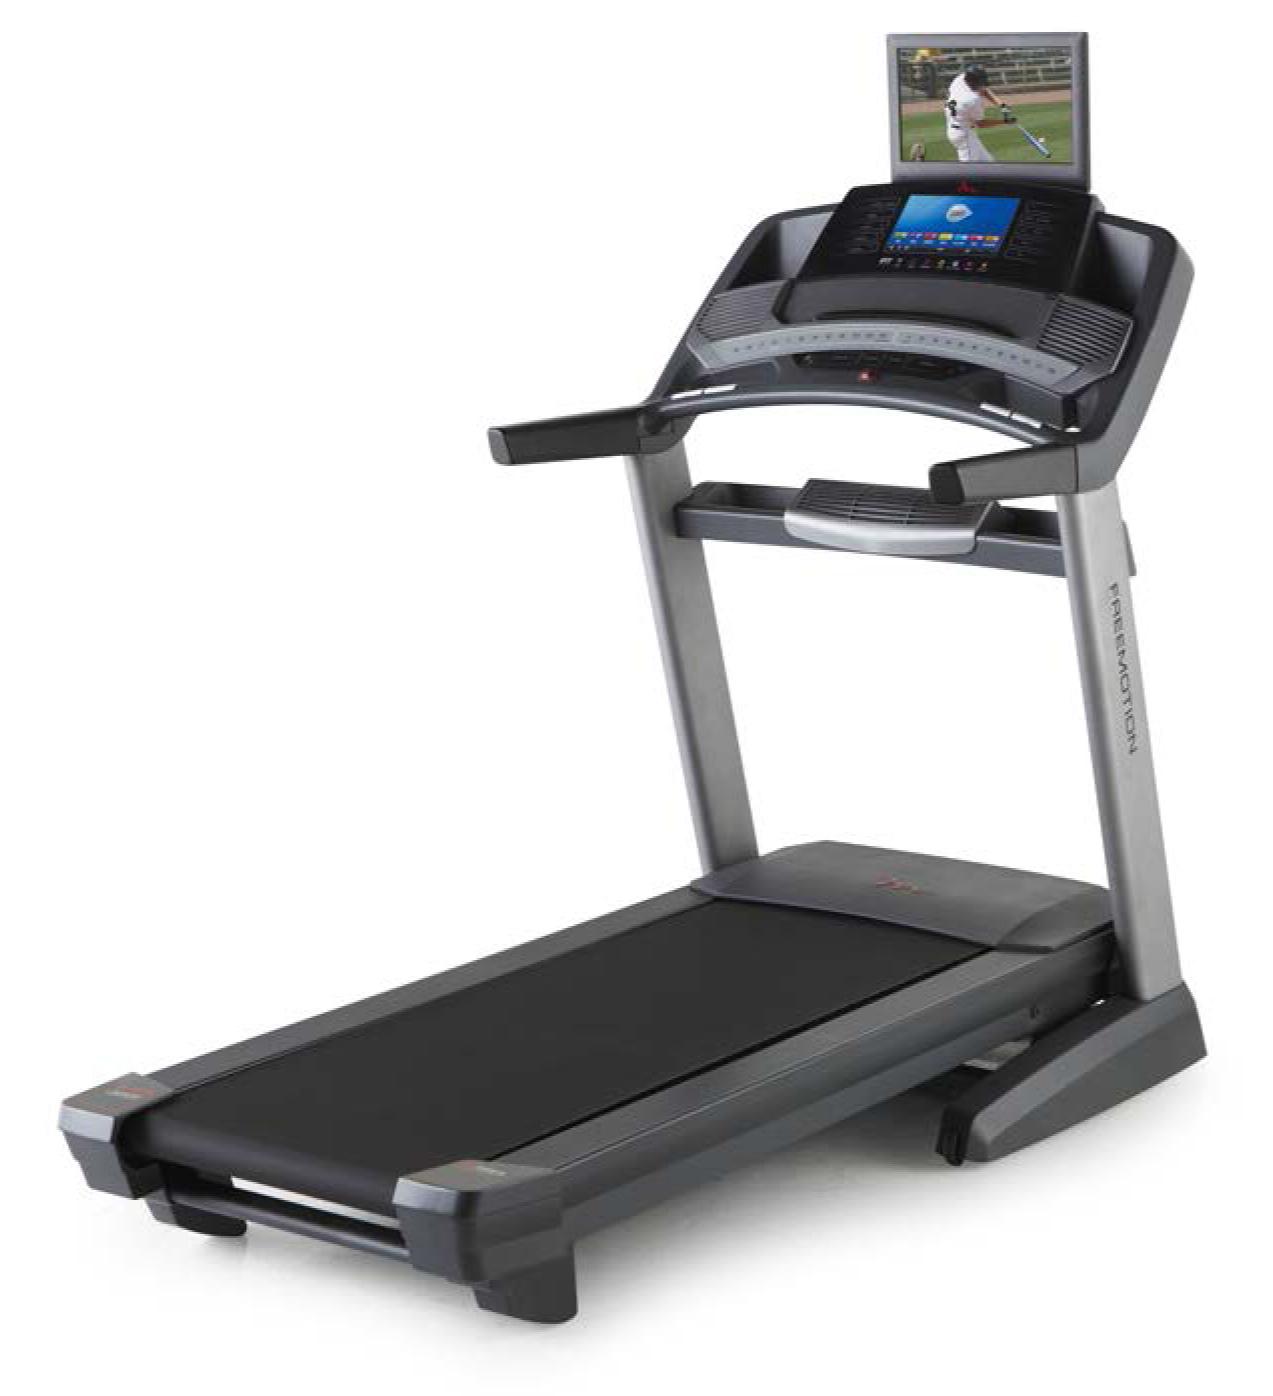 D754 06a: FreeMotion 890 Treadmill